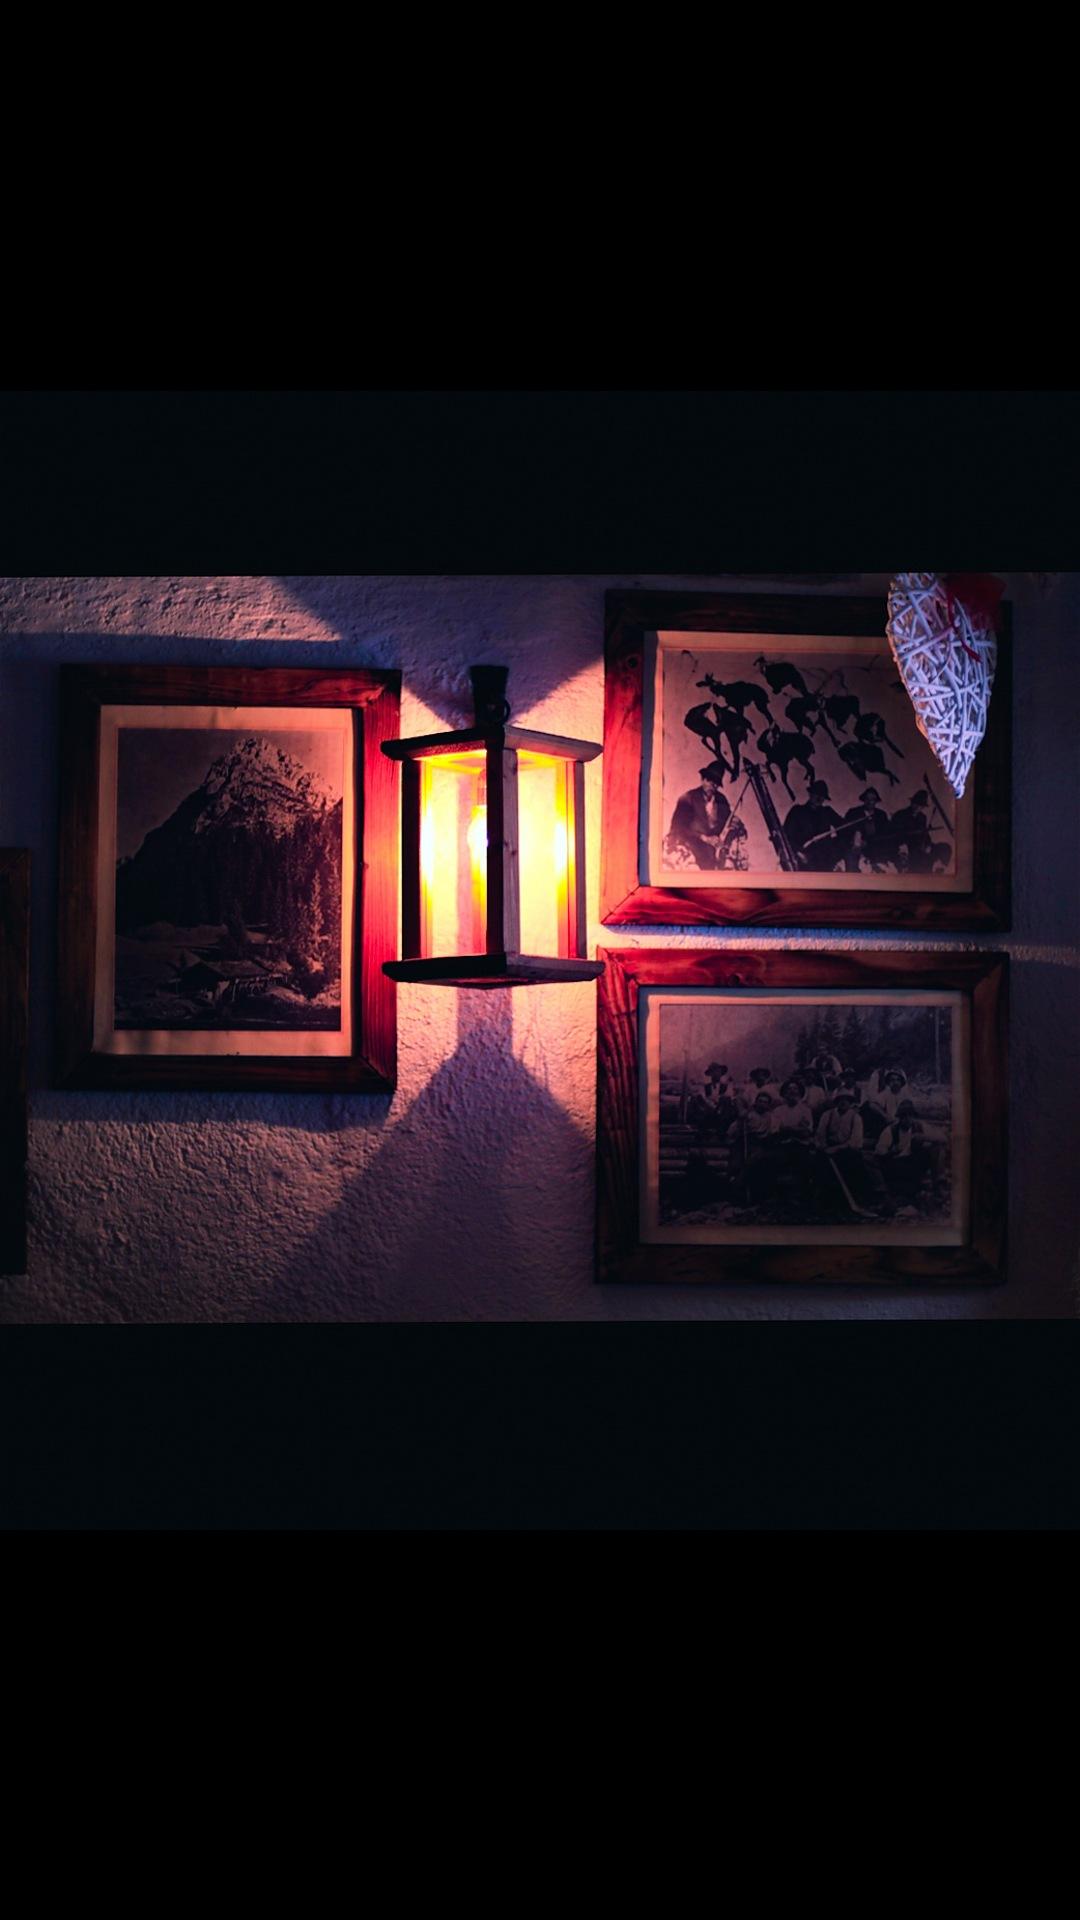 Light on Memories  by Davide greggio